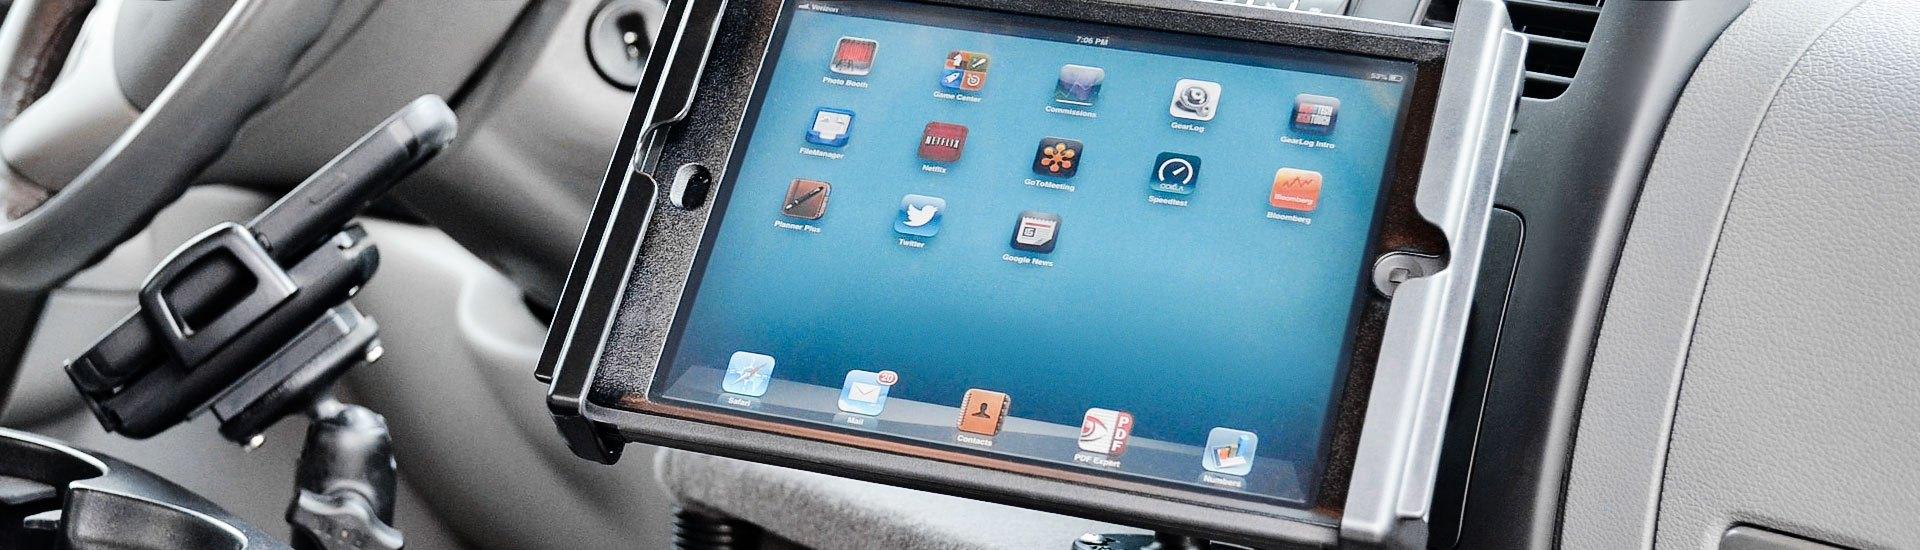 DC 3.1A Portable Mini 2-Port USB Universal Fast Car Charger For Phones laptop NJ